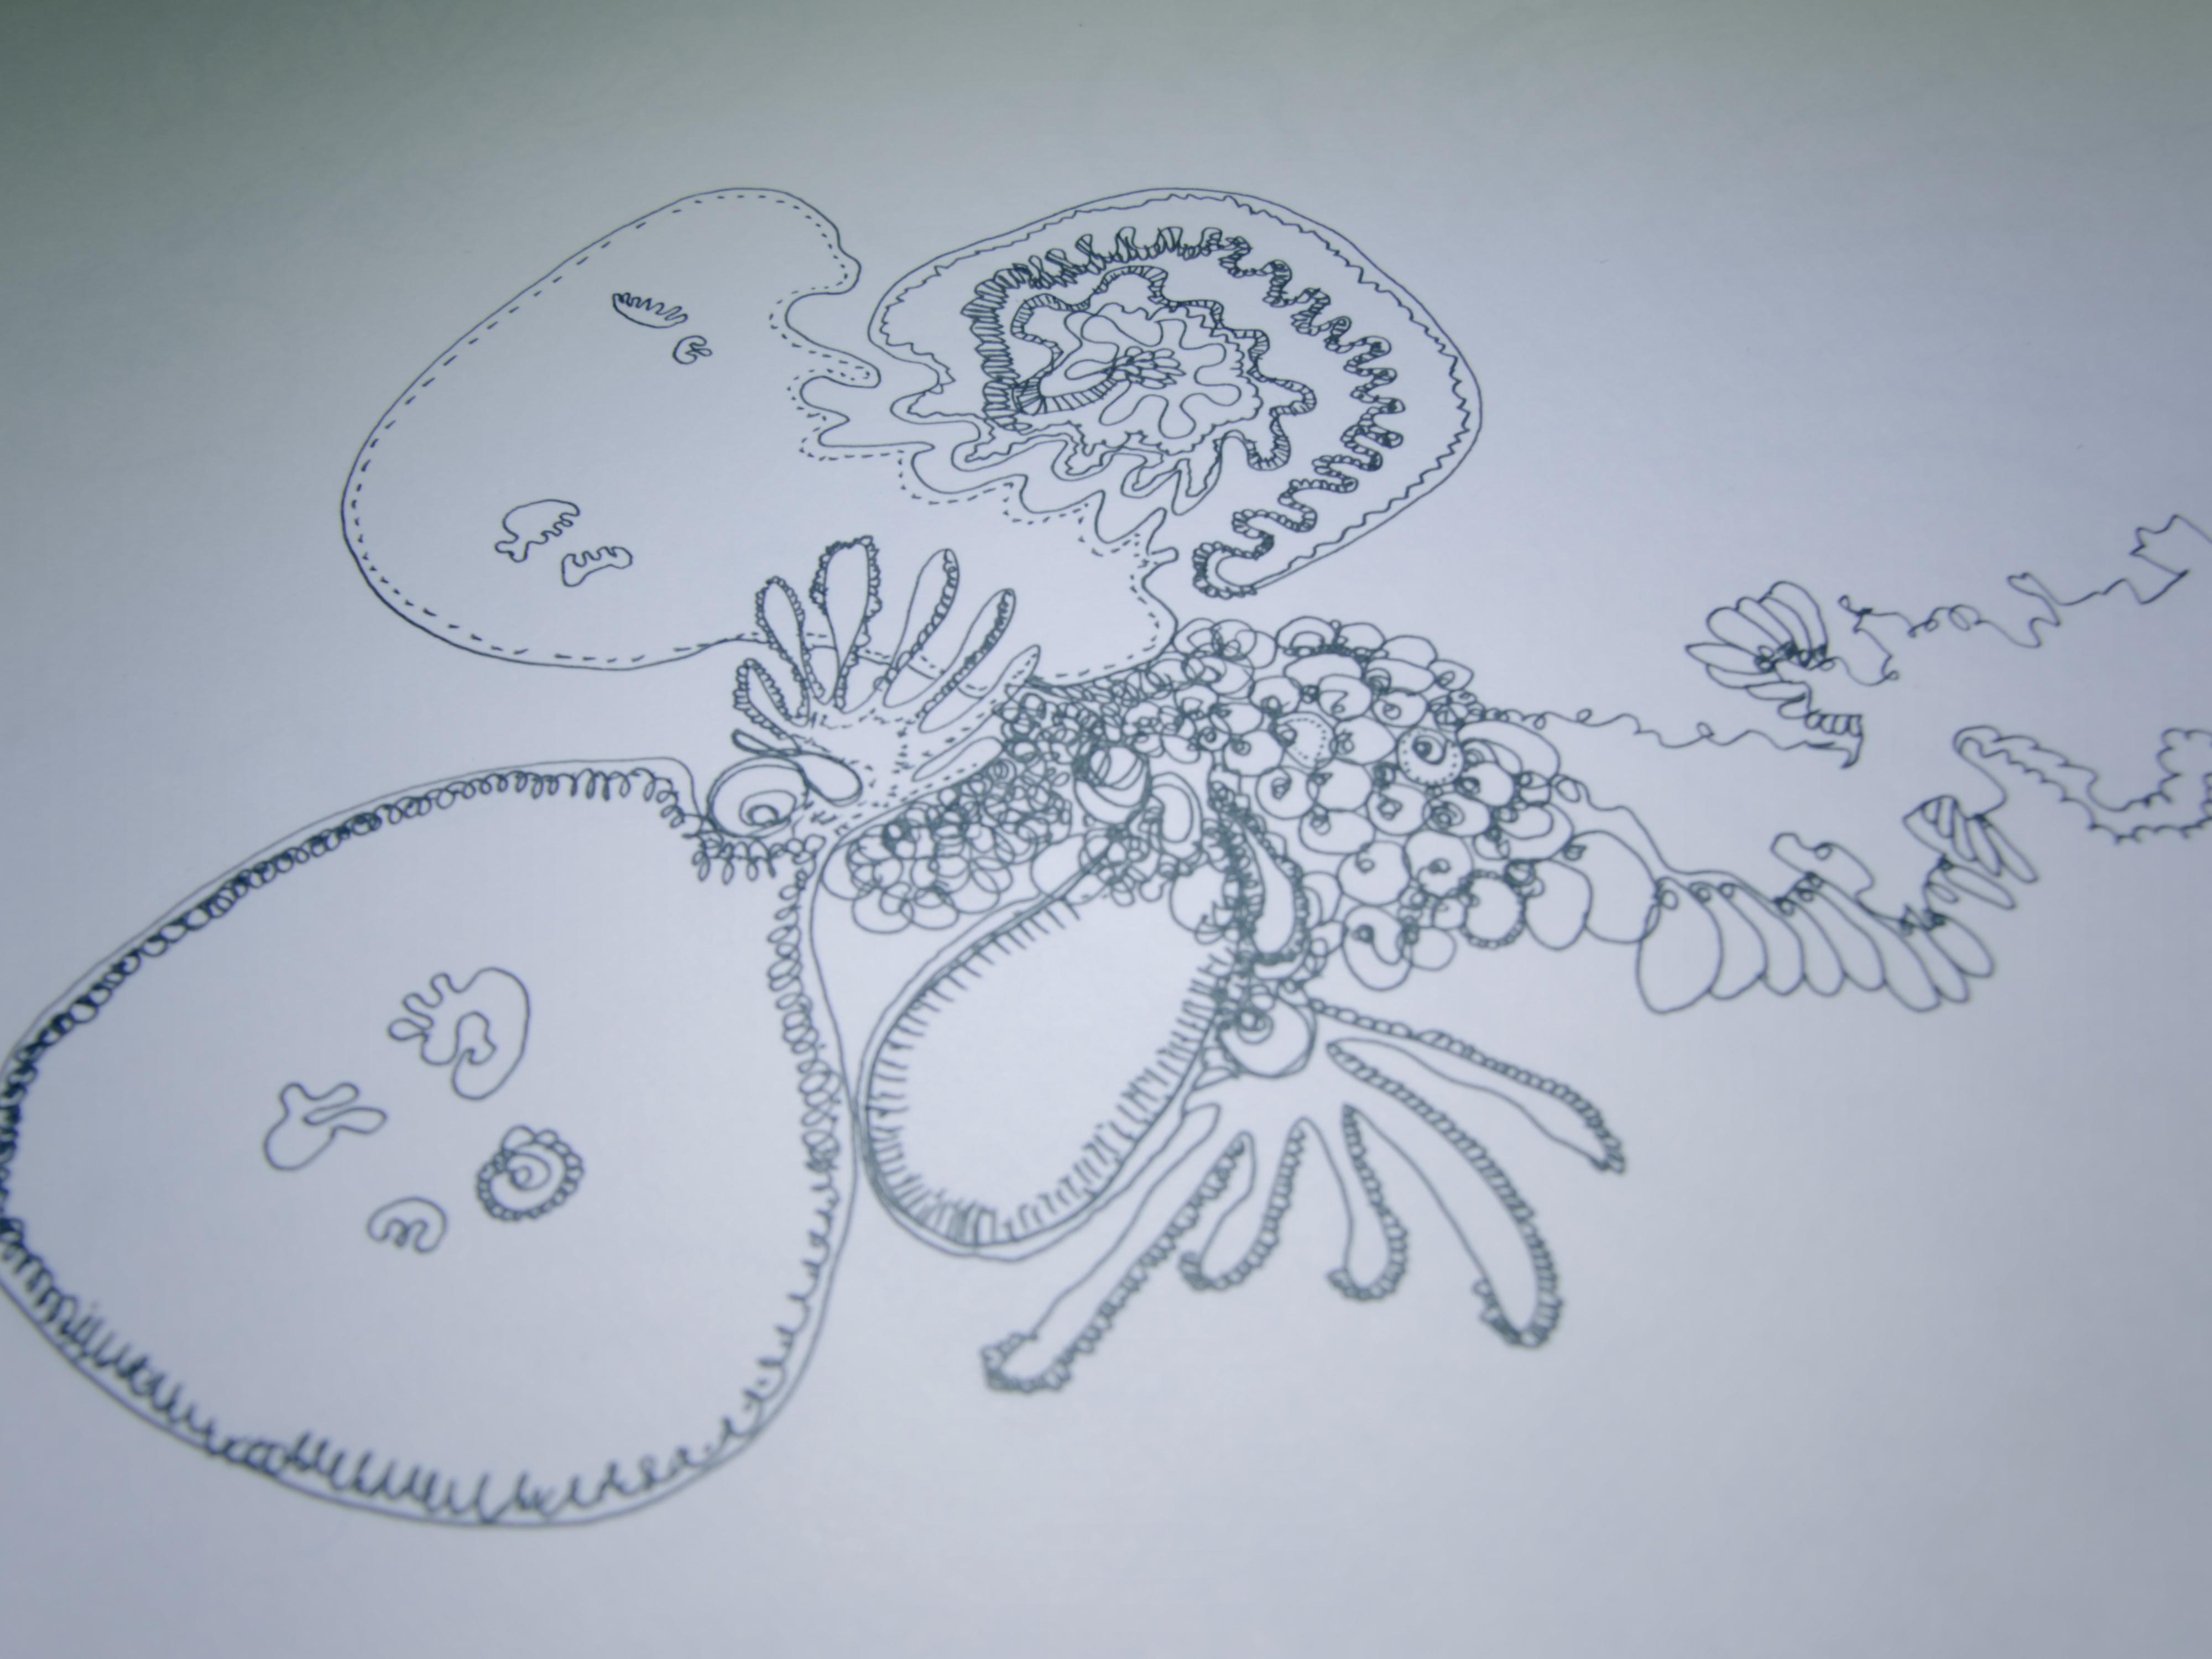 DG drawing #02